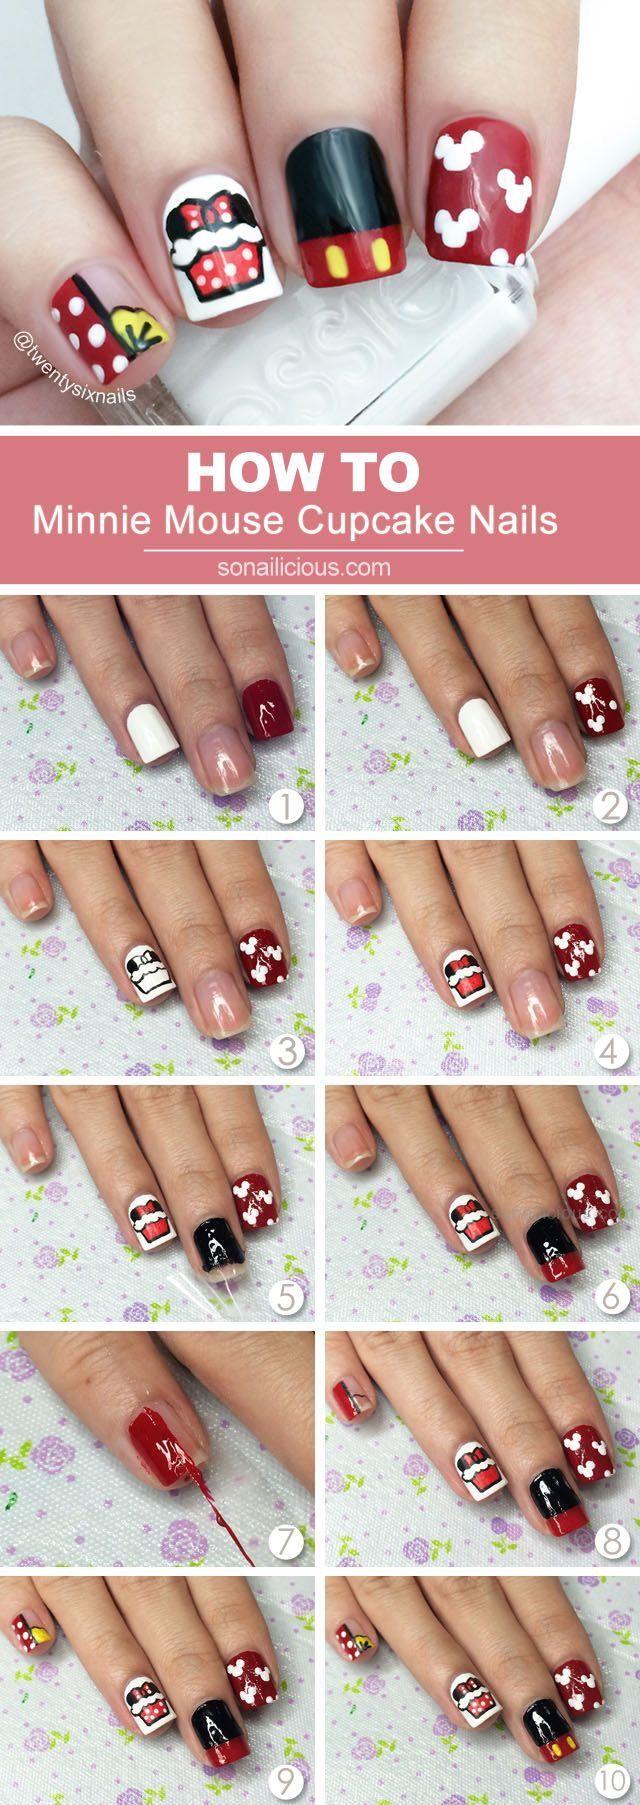 632 besten Beauty#love these nails! Bilder auf Pinterest   Beauty ...